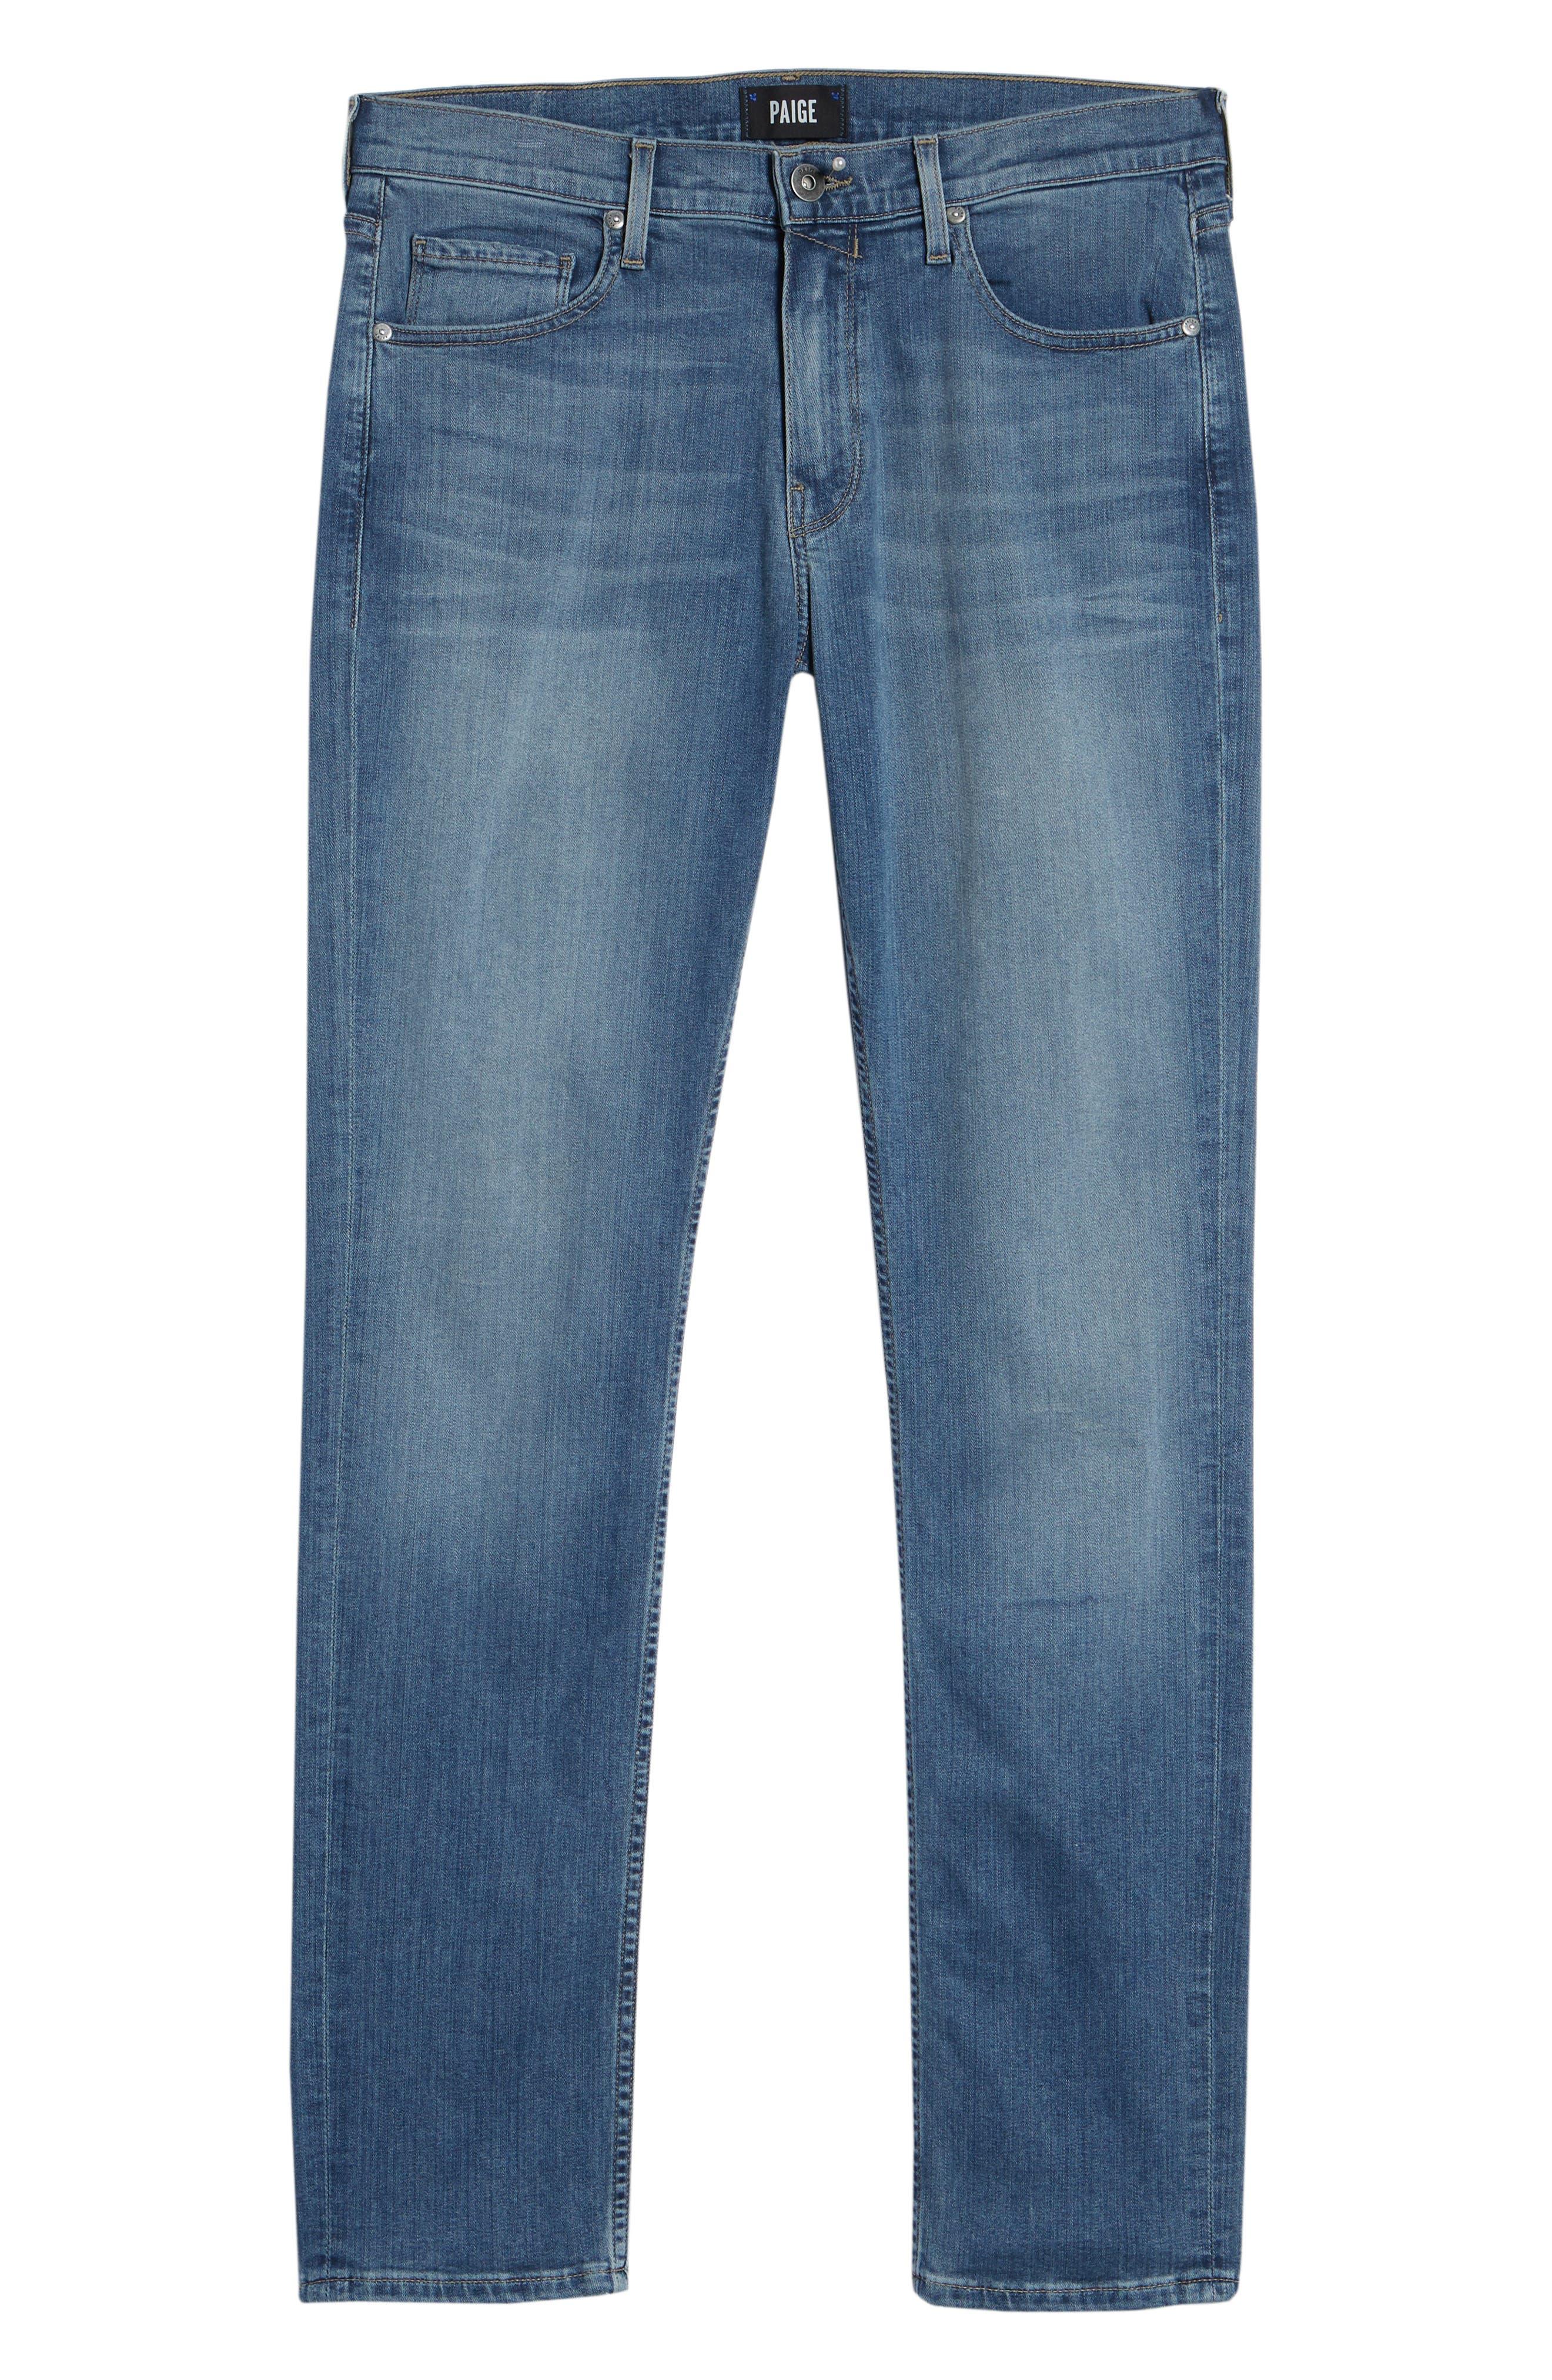 Transcend - Lennox Slim Fit Jeans,                             Alternate thumbnail 6, color,                             Allman